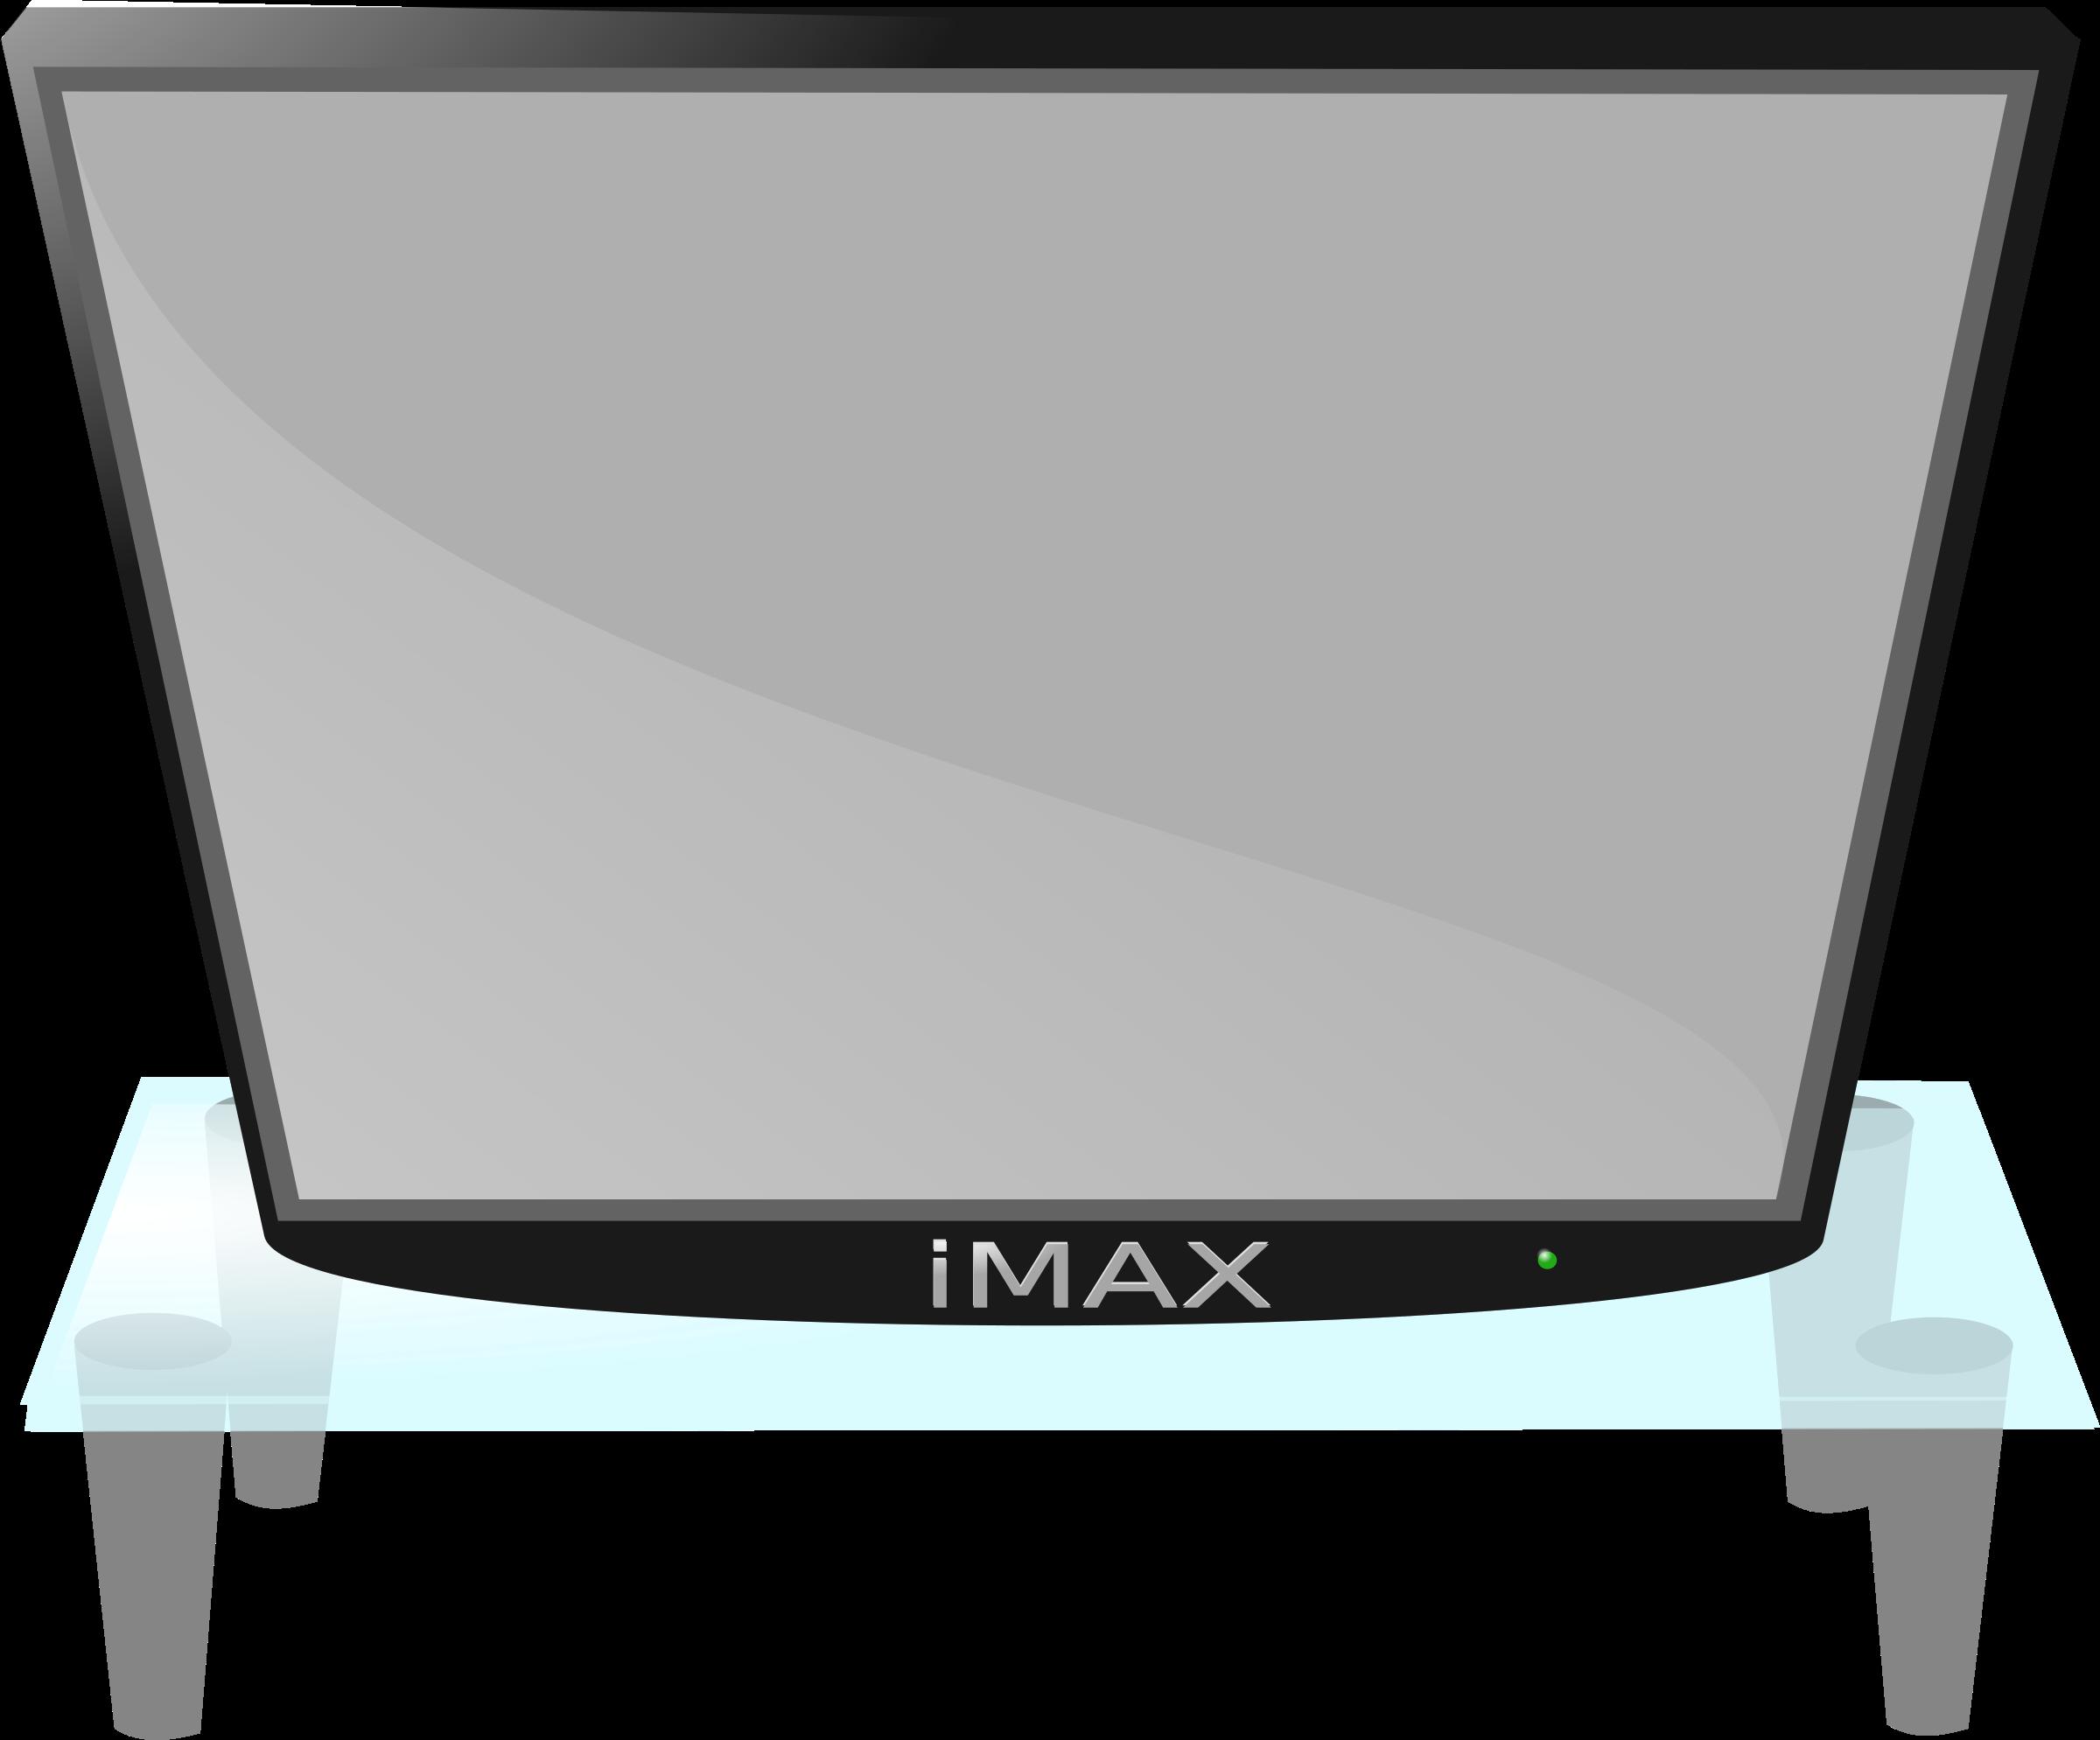 Big image png. Television clipart tv set